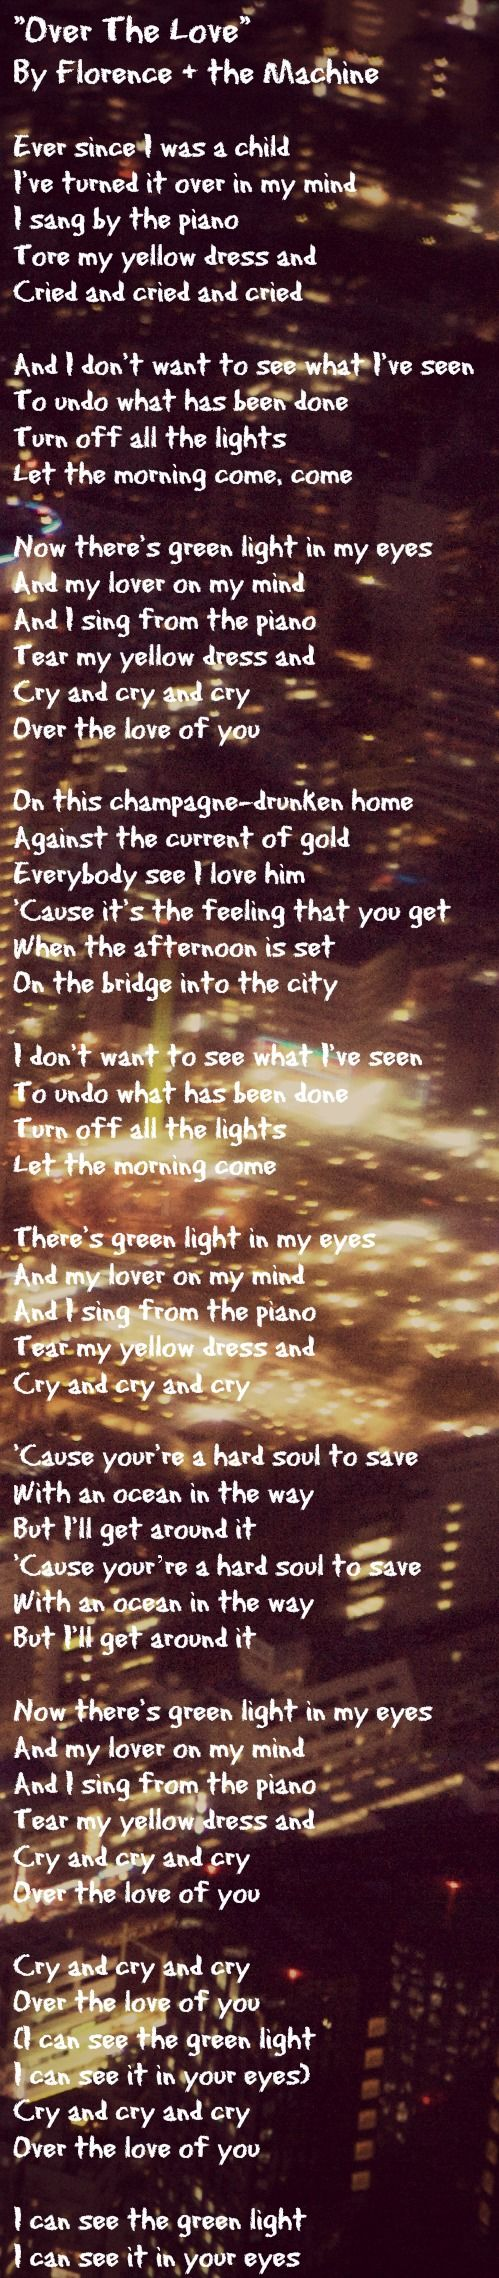 Yellow dress lyrics gatsby